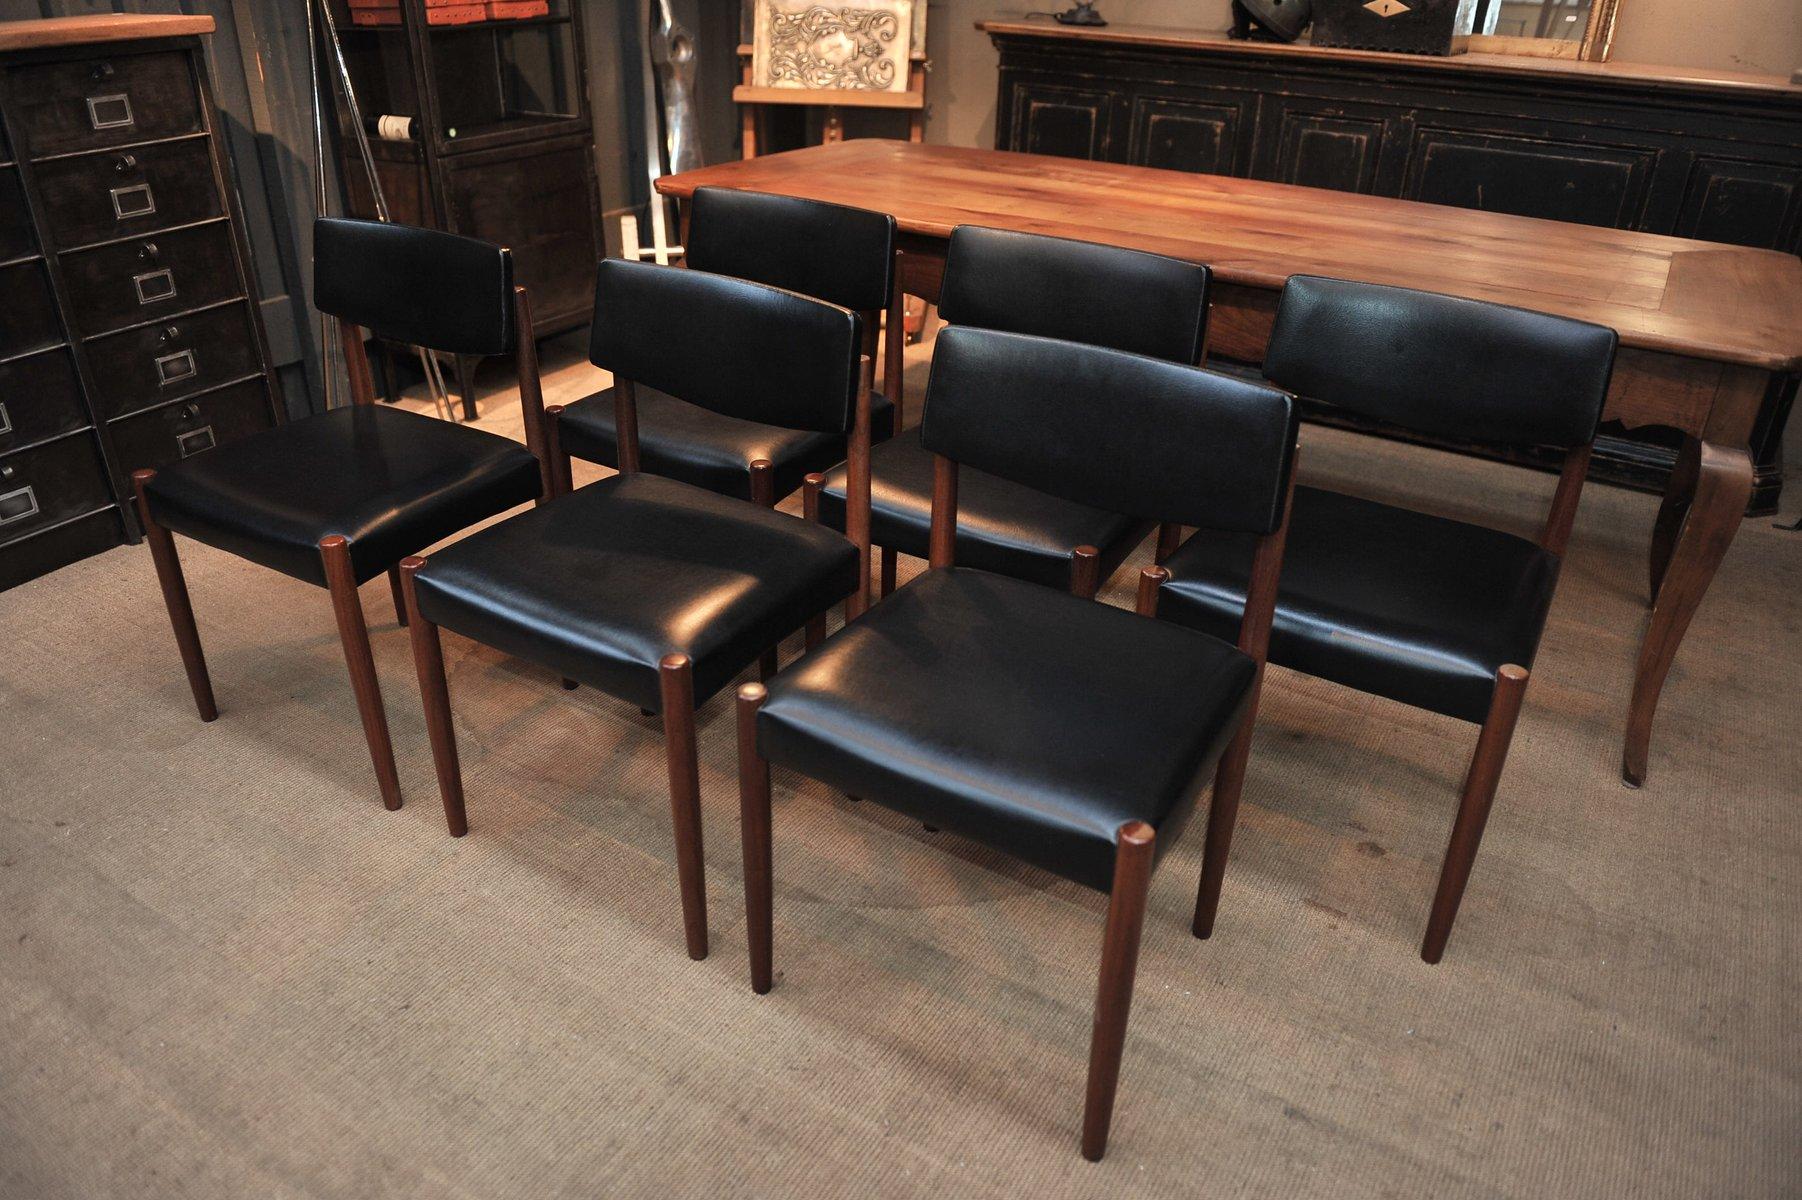 skandinavische mid century st hle aus teakholz. Black Bedroom Furniture Sets. Home Design Ideas